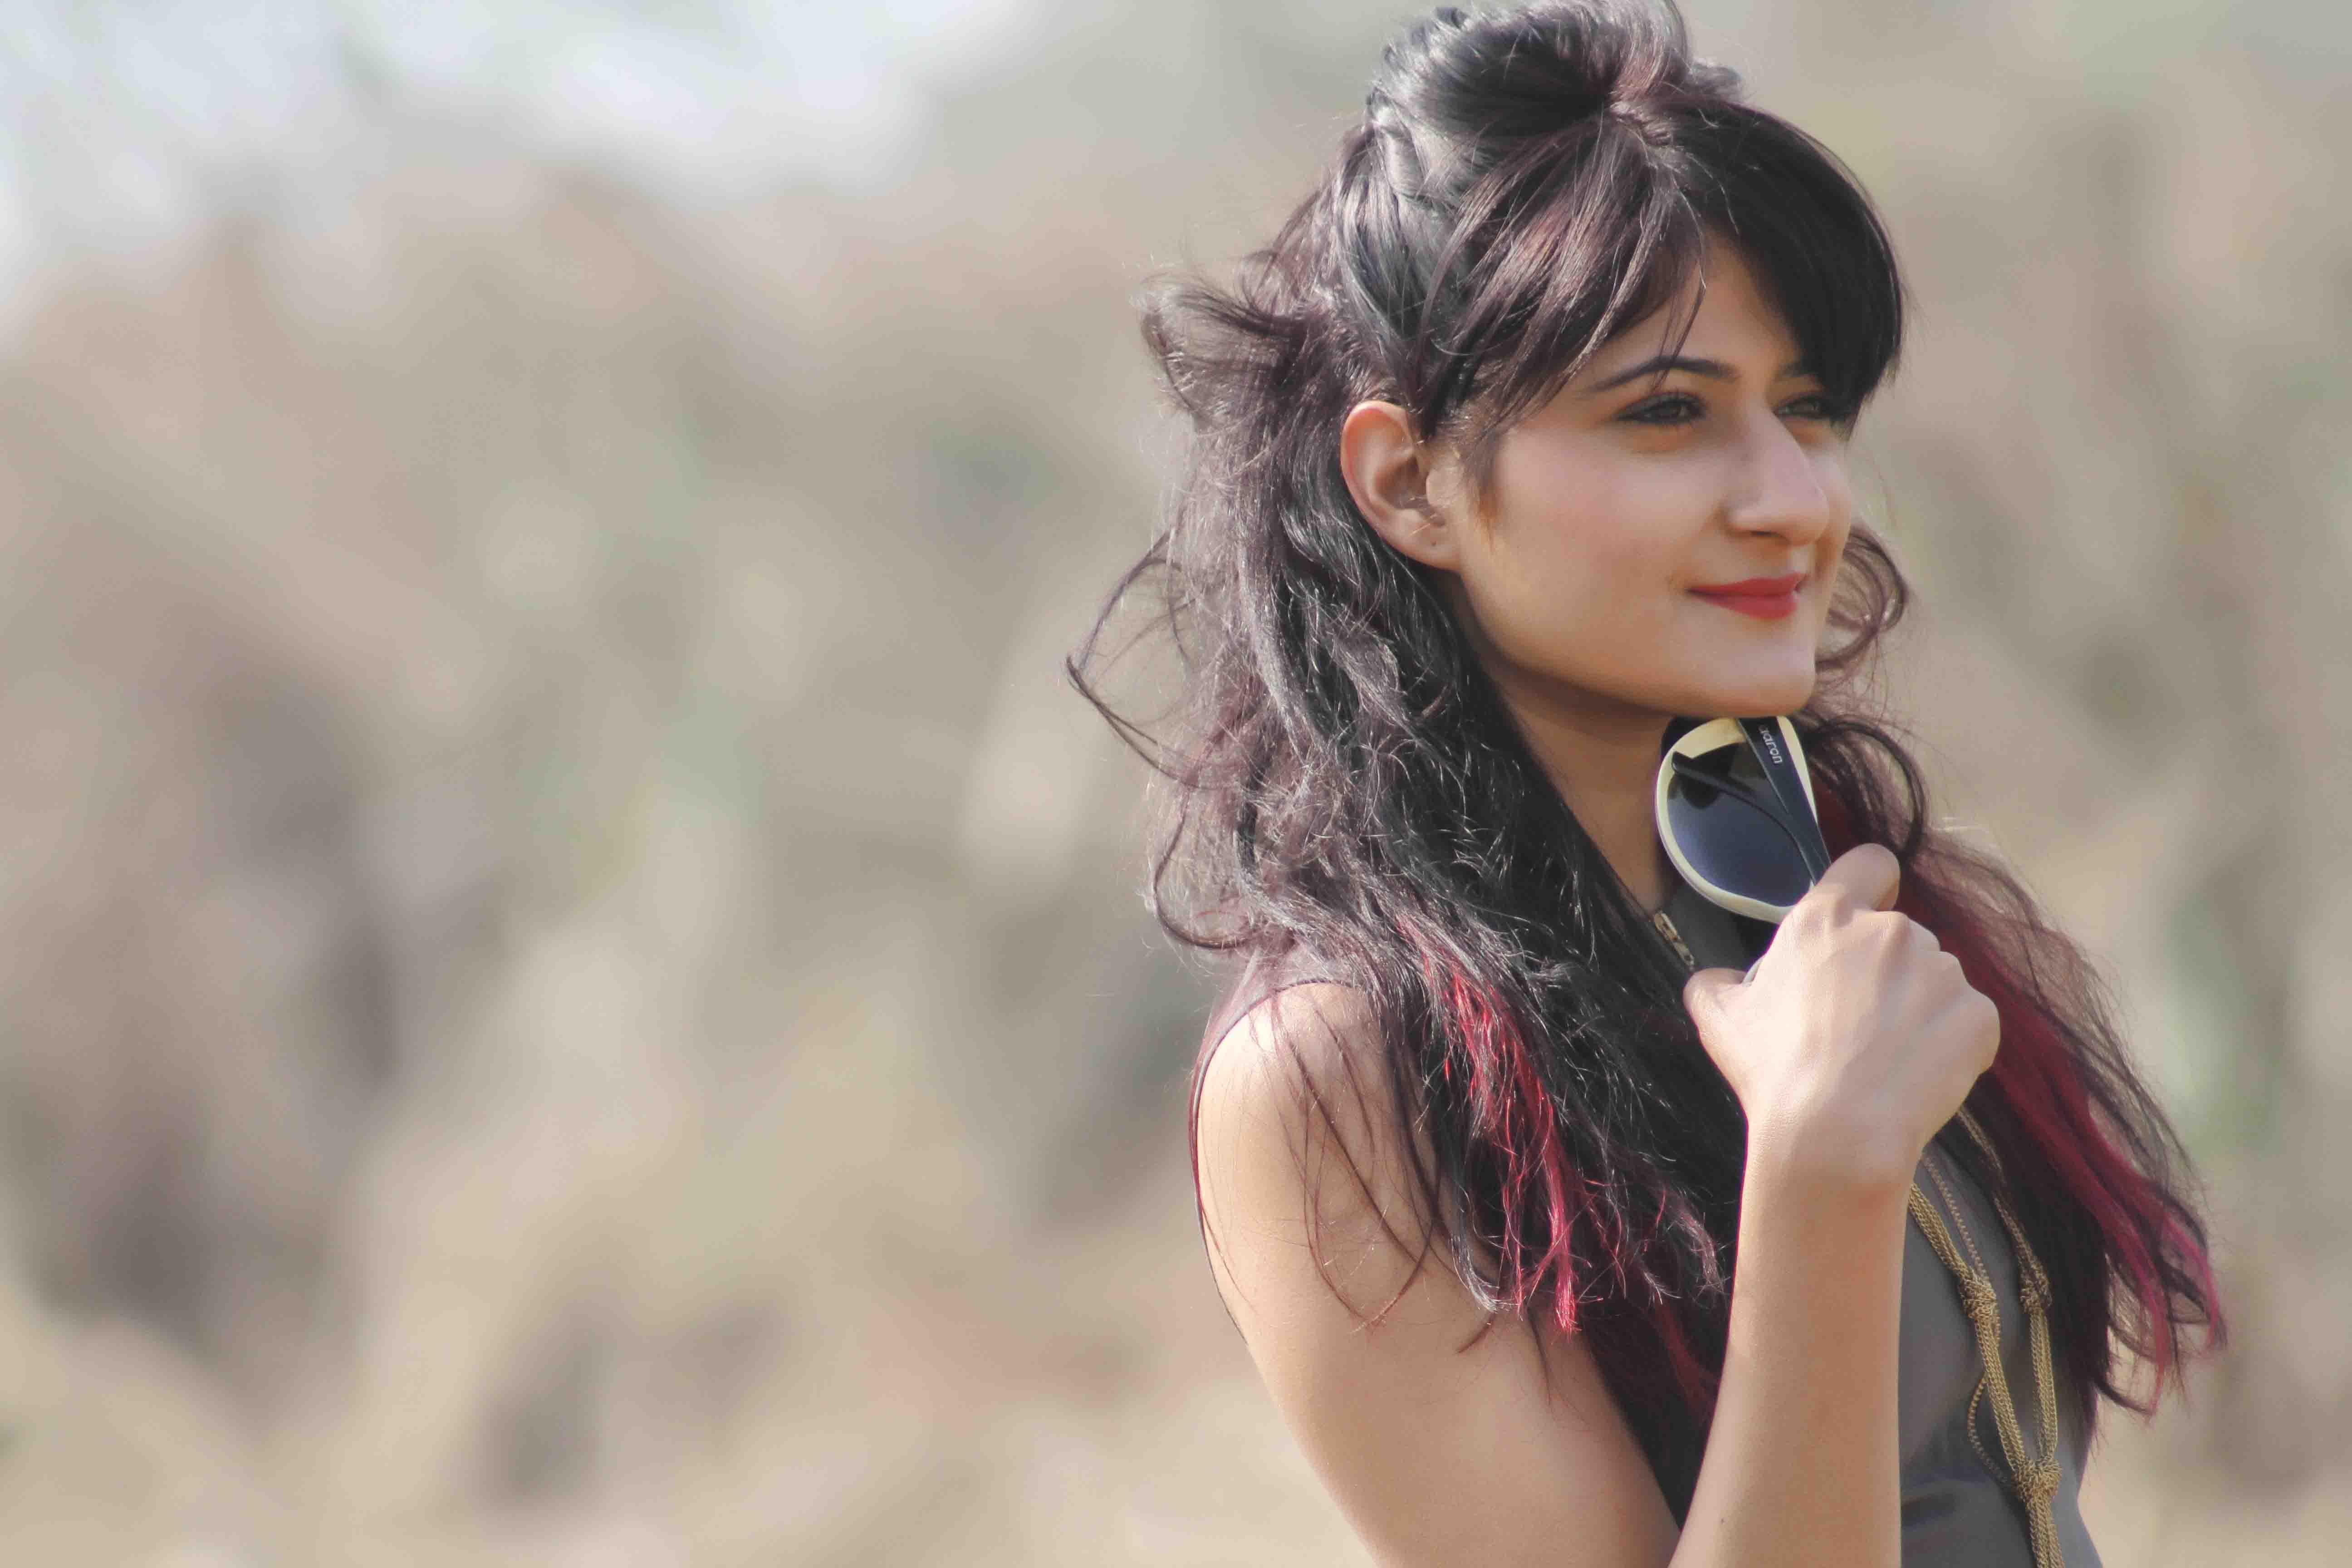 Aarkay clicx